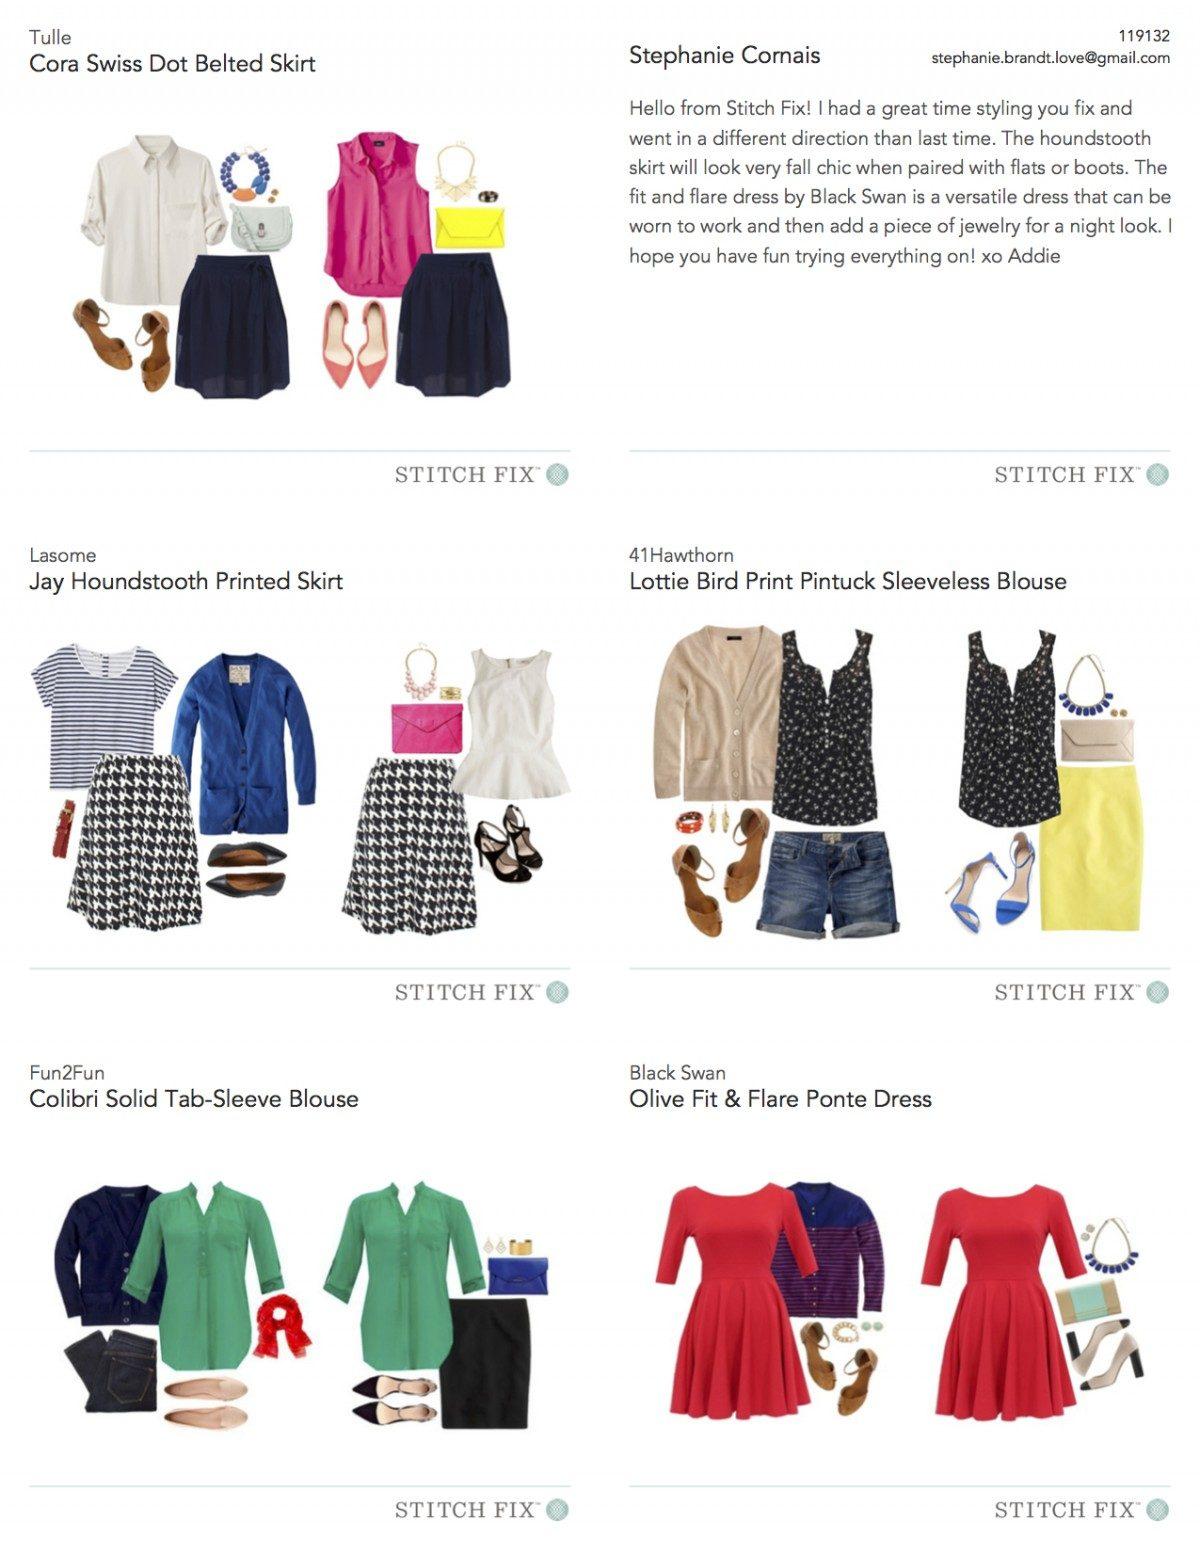 Stylecards for shipment 119132